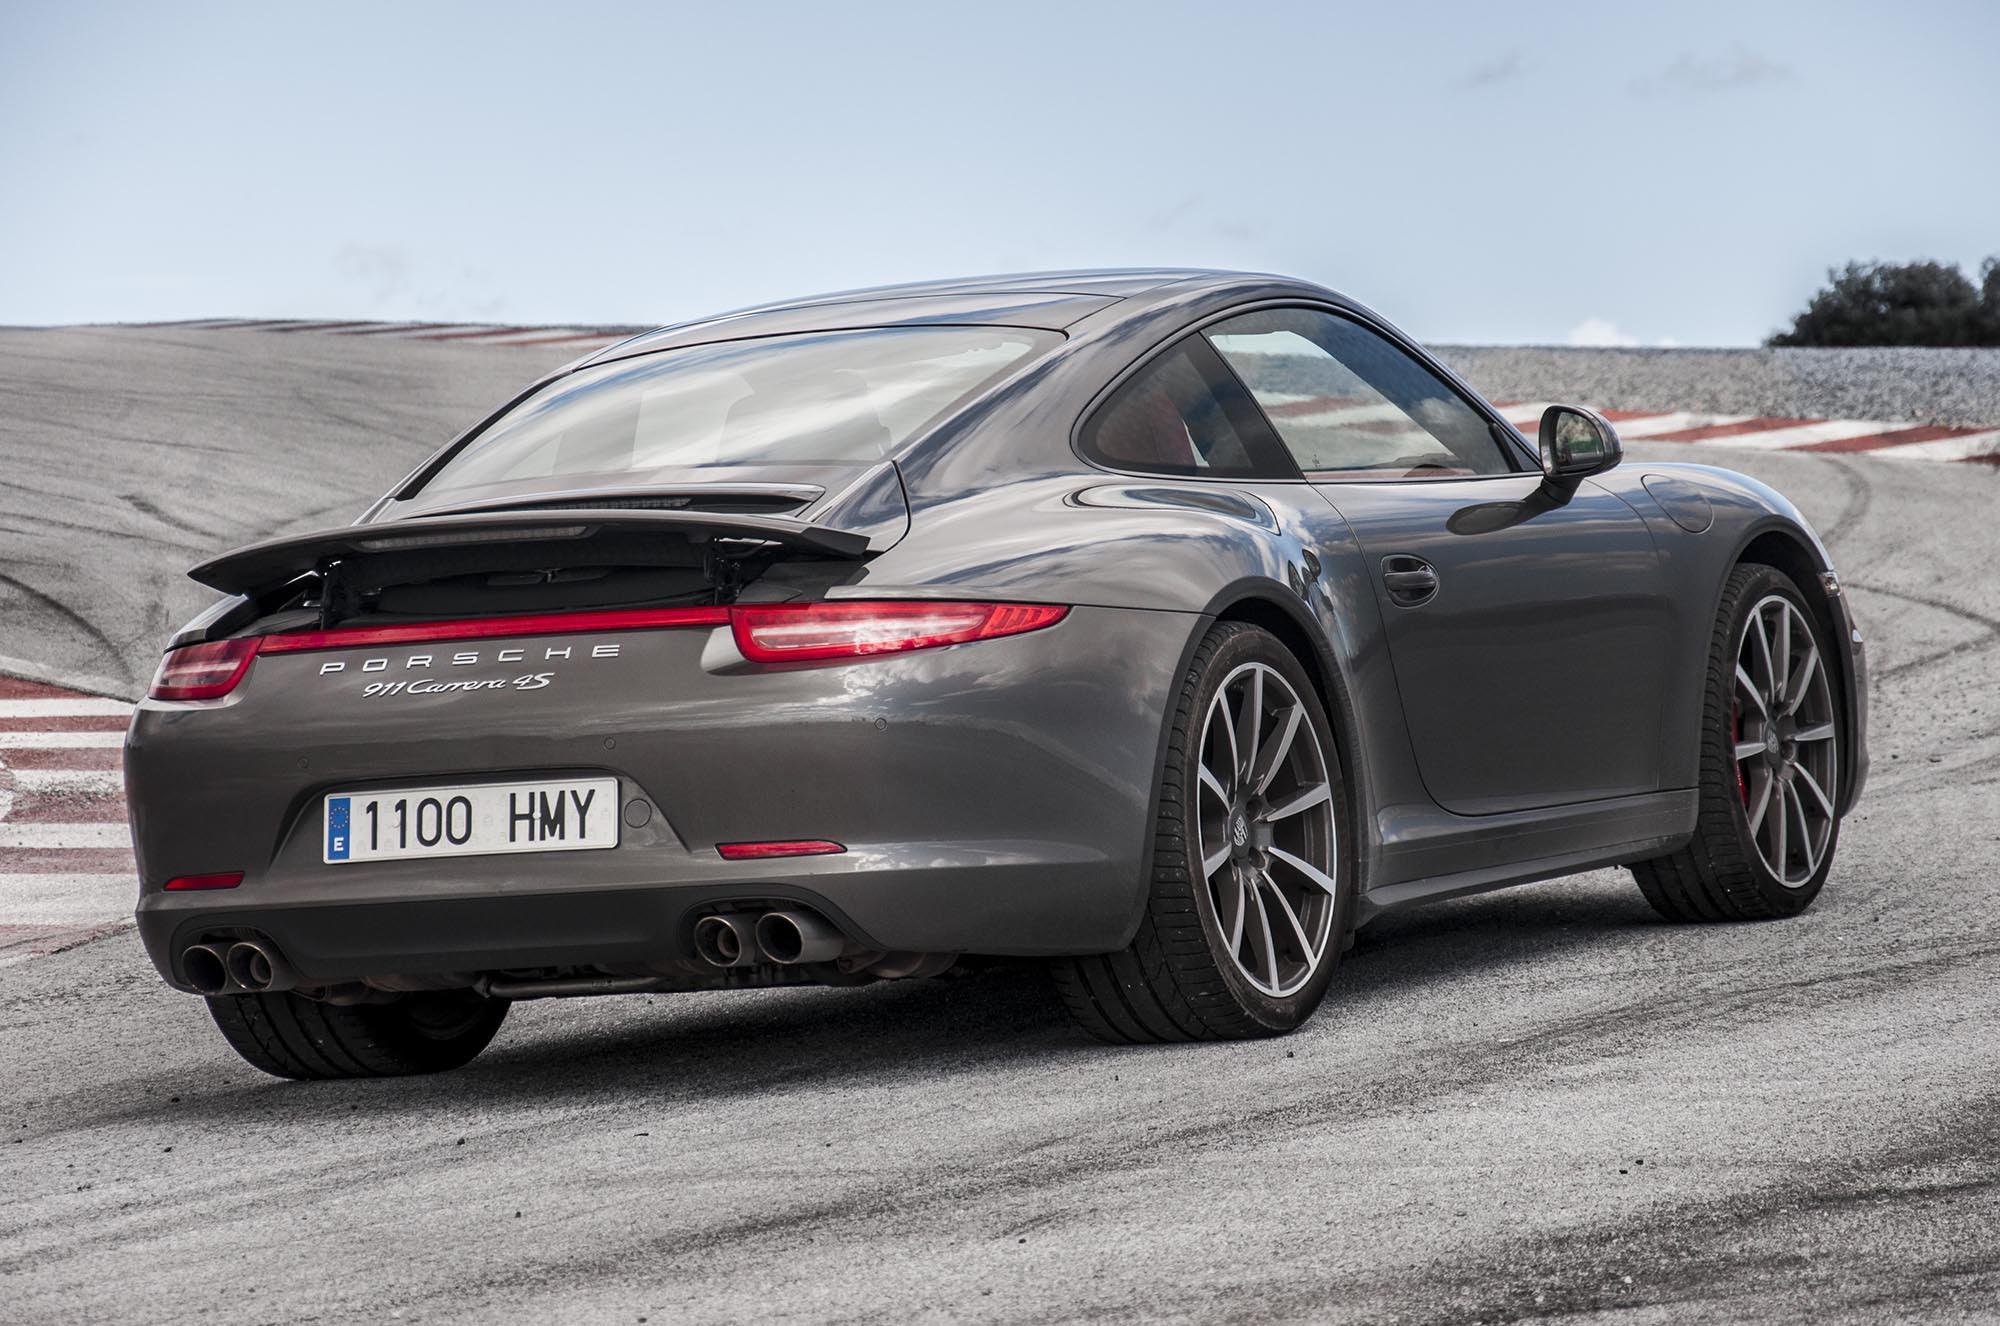 Immatriculation De Votre Porsche 911 Carrera 4s